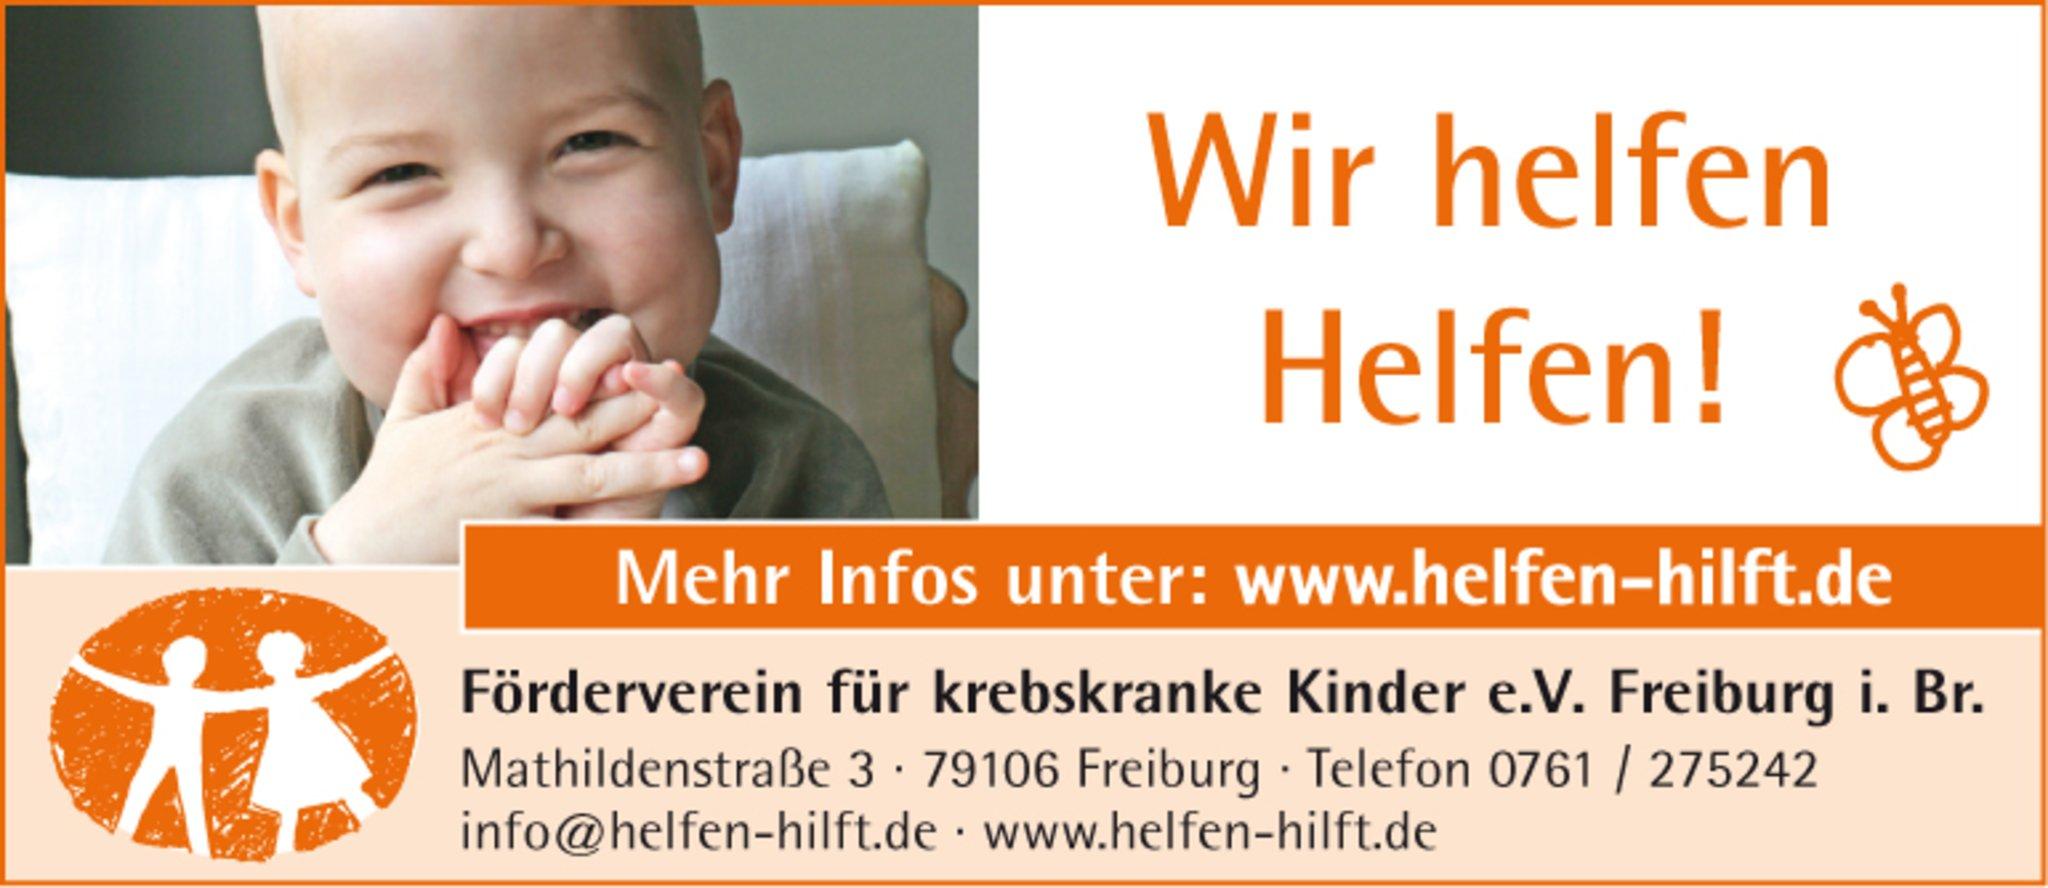 Förderverein für krebskranke Kinder e. V. Freiburg